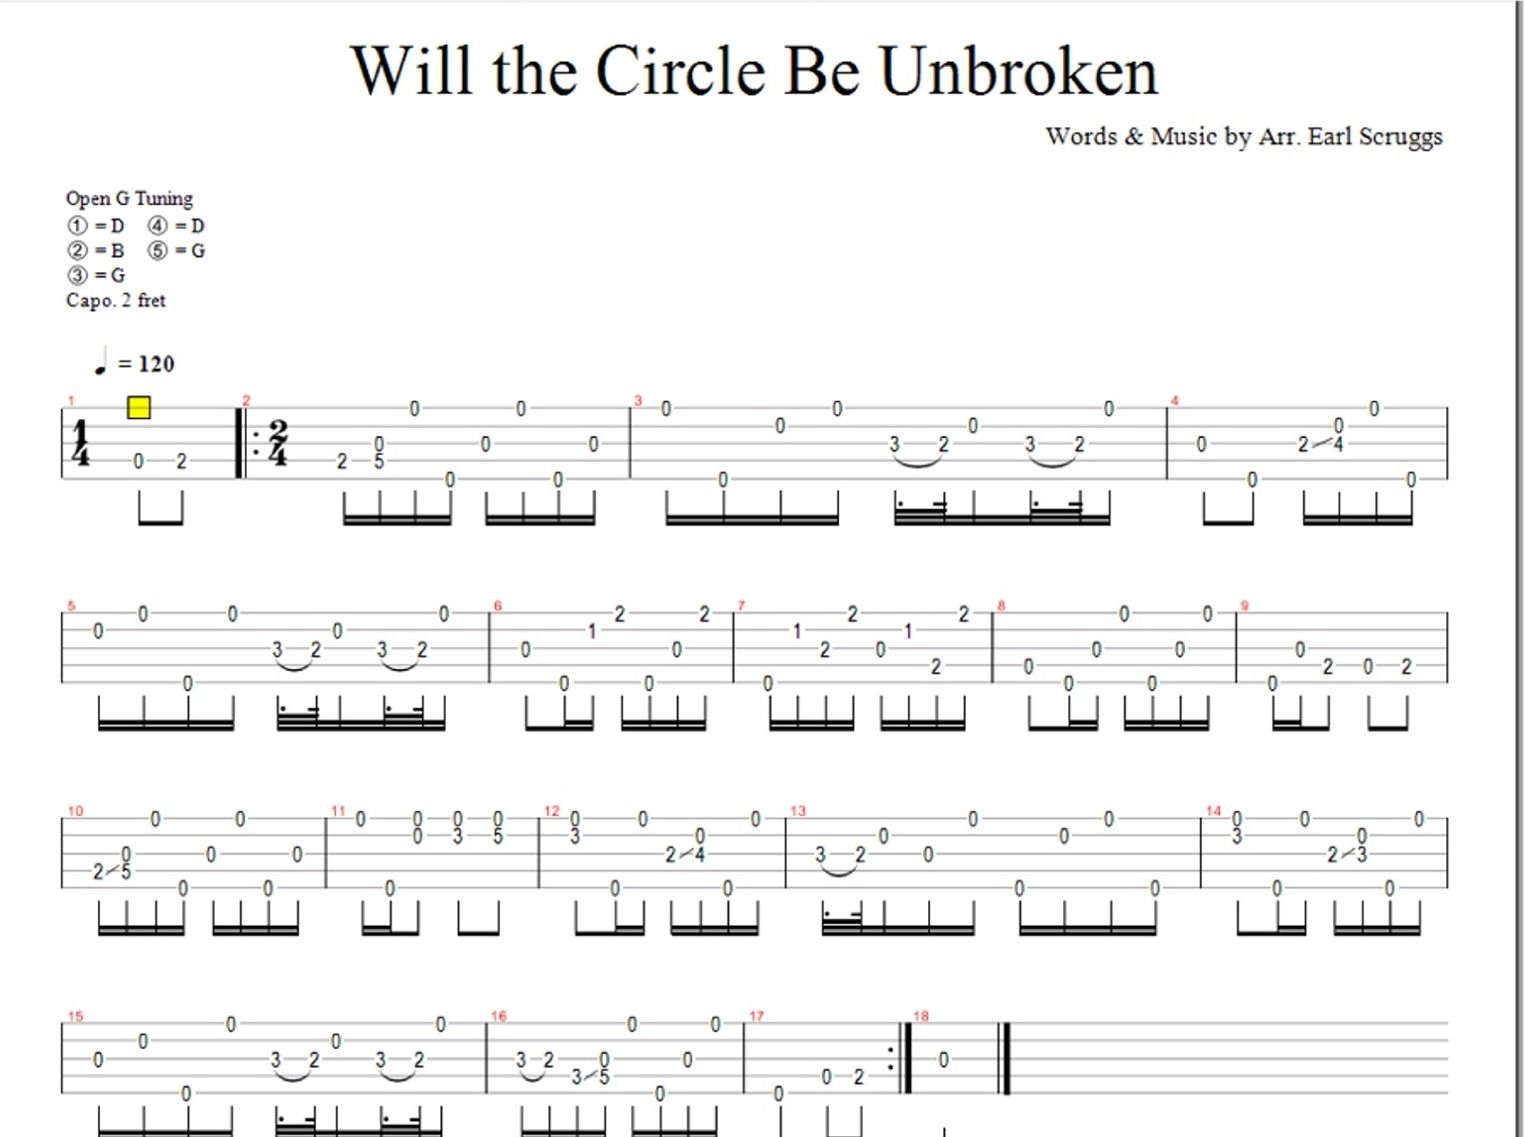 Banjo tabulaturytablaturetabtabs banjo tabulatury banjo tabulaturytablaturetabtabs hexwebz Images